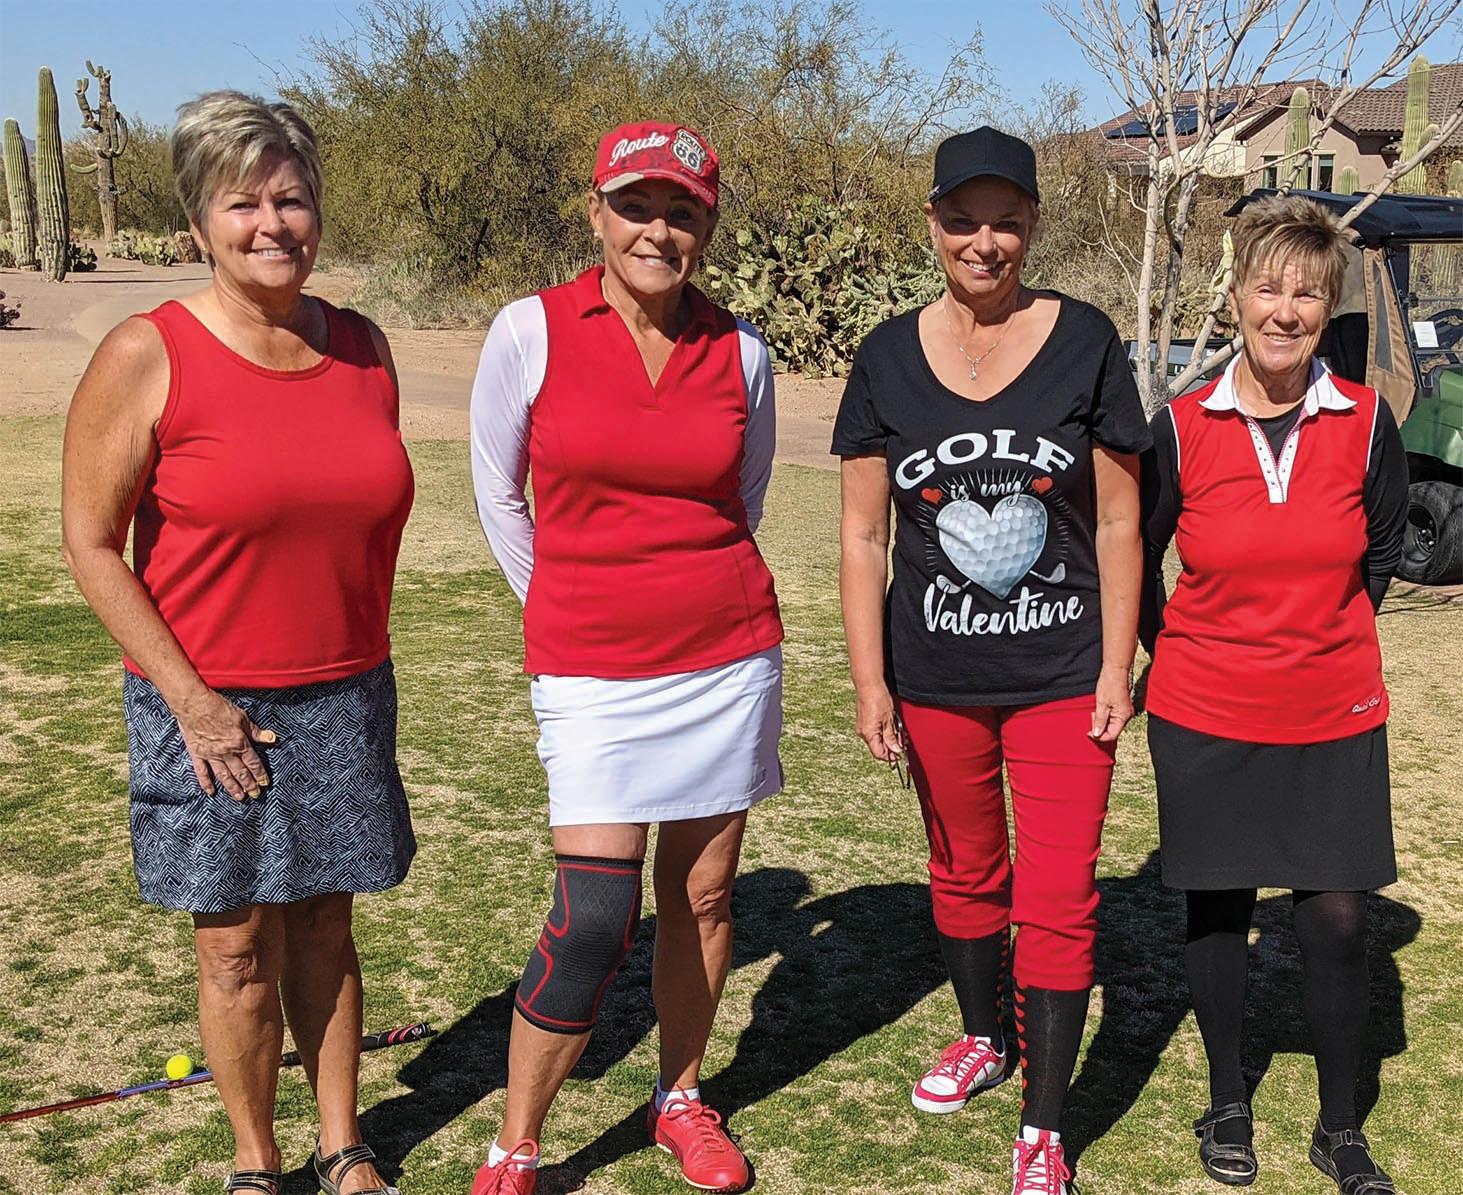 Kate Schwartz, Janet Johnson, Debbie Riddell, and Karen Stensrud